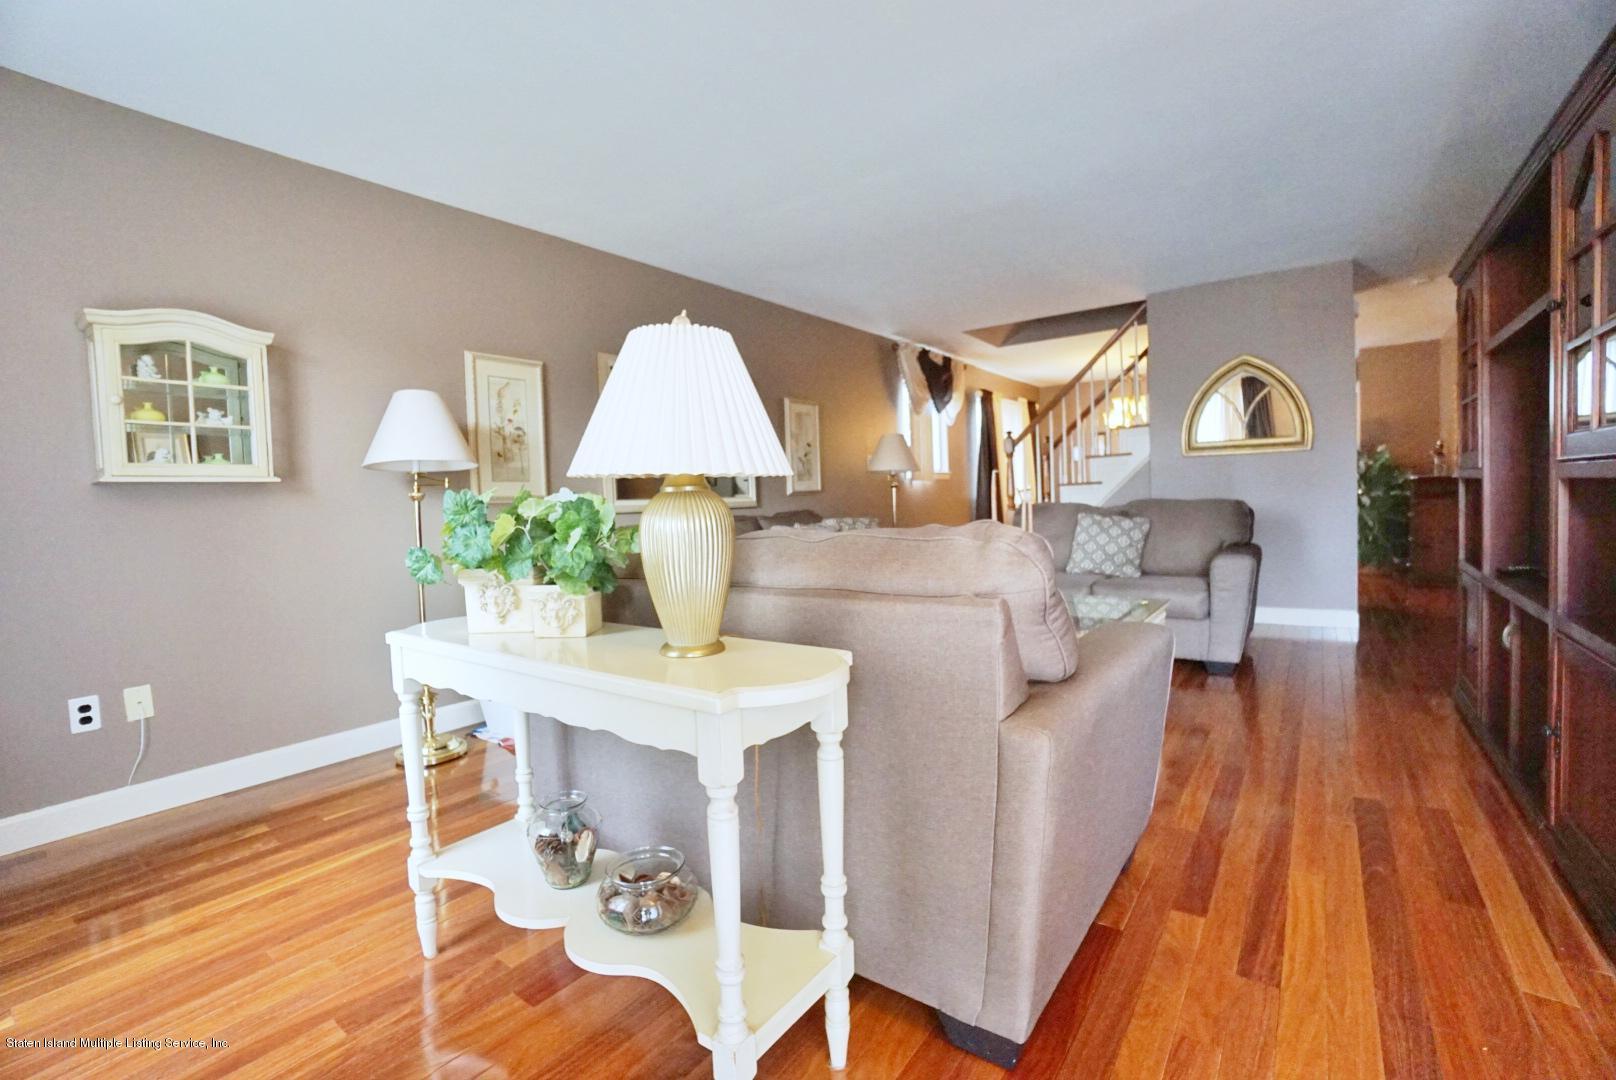 83 Salamander Court,Staten Island,New York,10309,United States,3 Bedrooms Bedrooms,6 Rooms Rooms,2 BathroomsBathrooms,Residential,Salamander,1135725